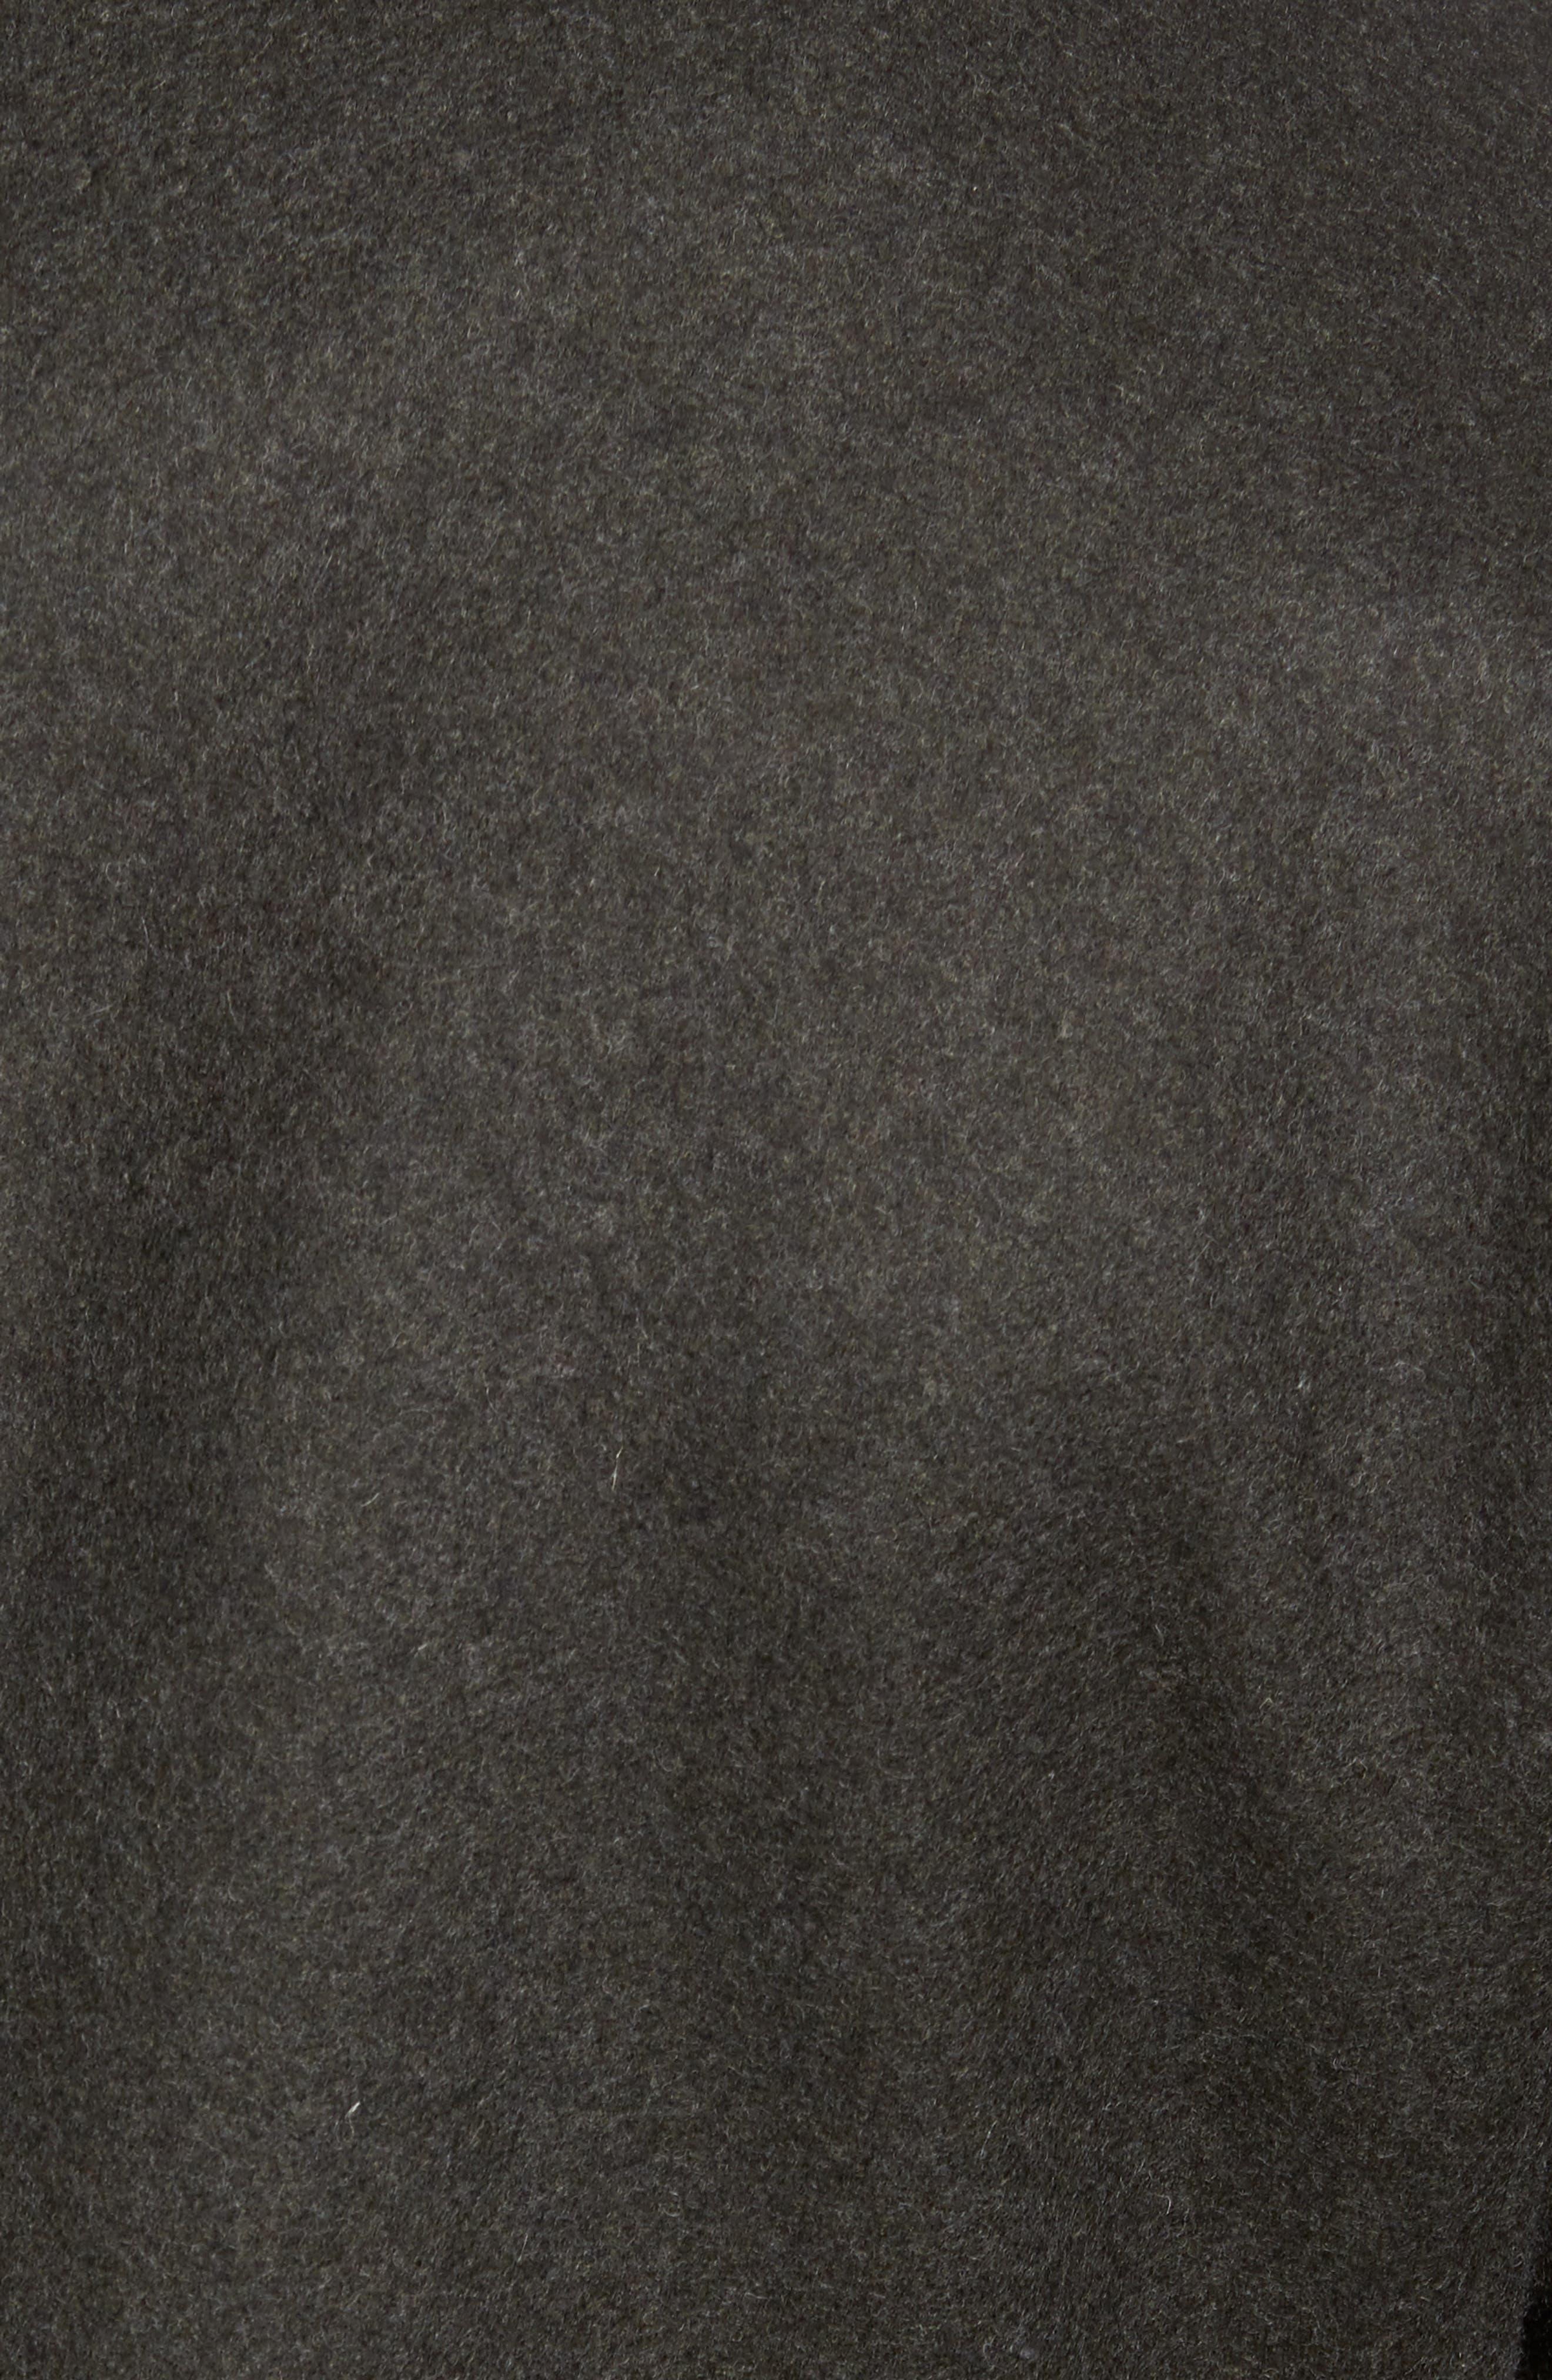 'Bond' Wool Blend Peacoat,                             Alternate thumbnail 6, color,                             315